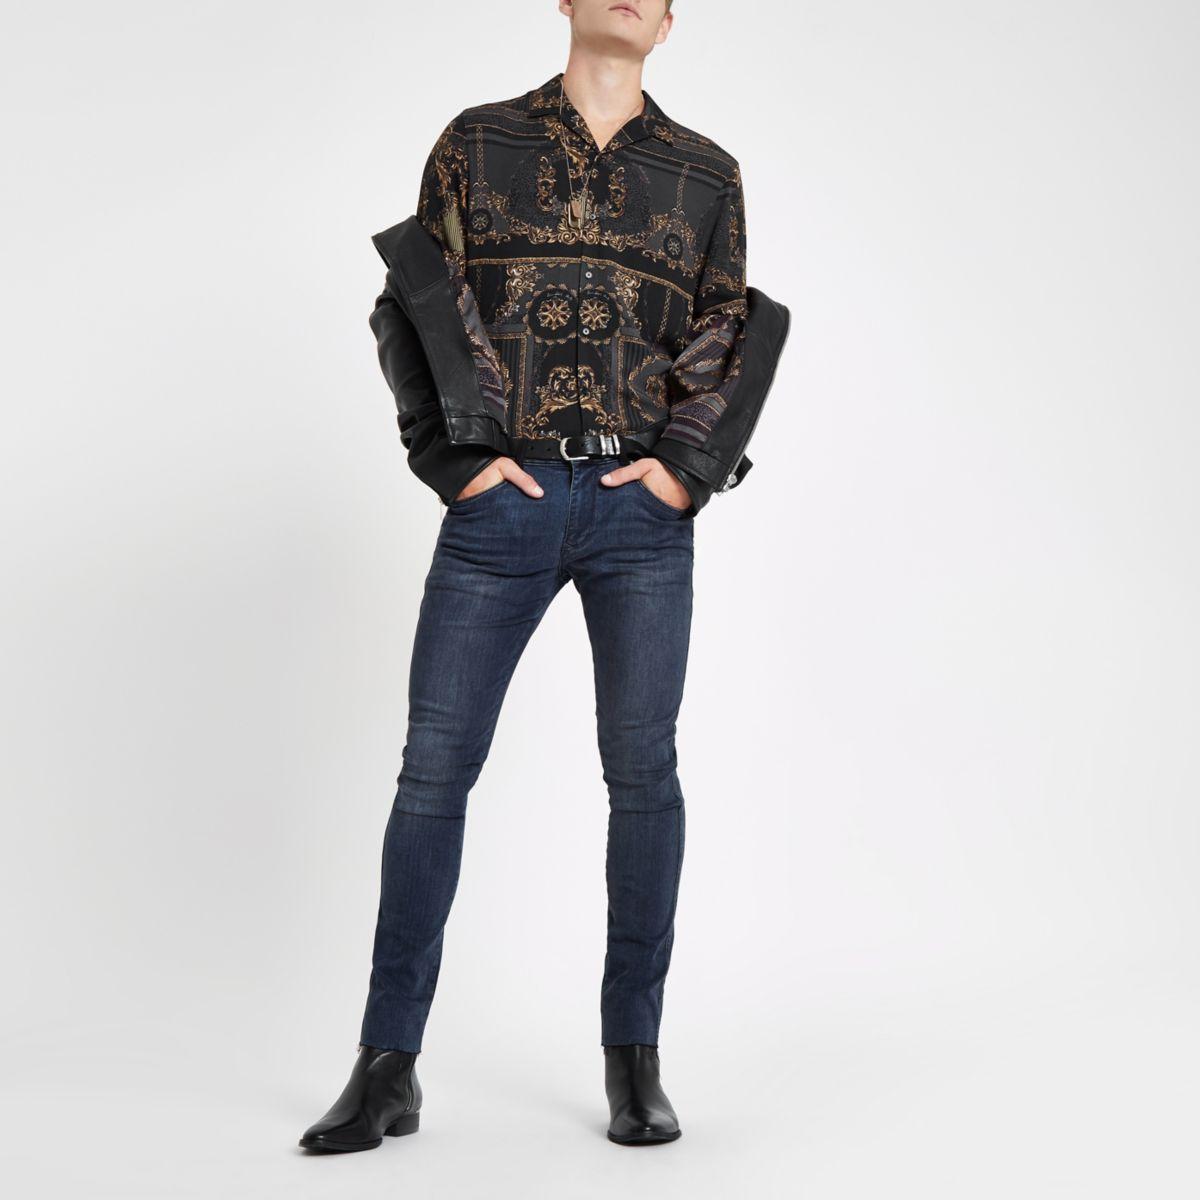 RI 30 black baroque print shirt